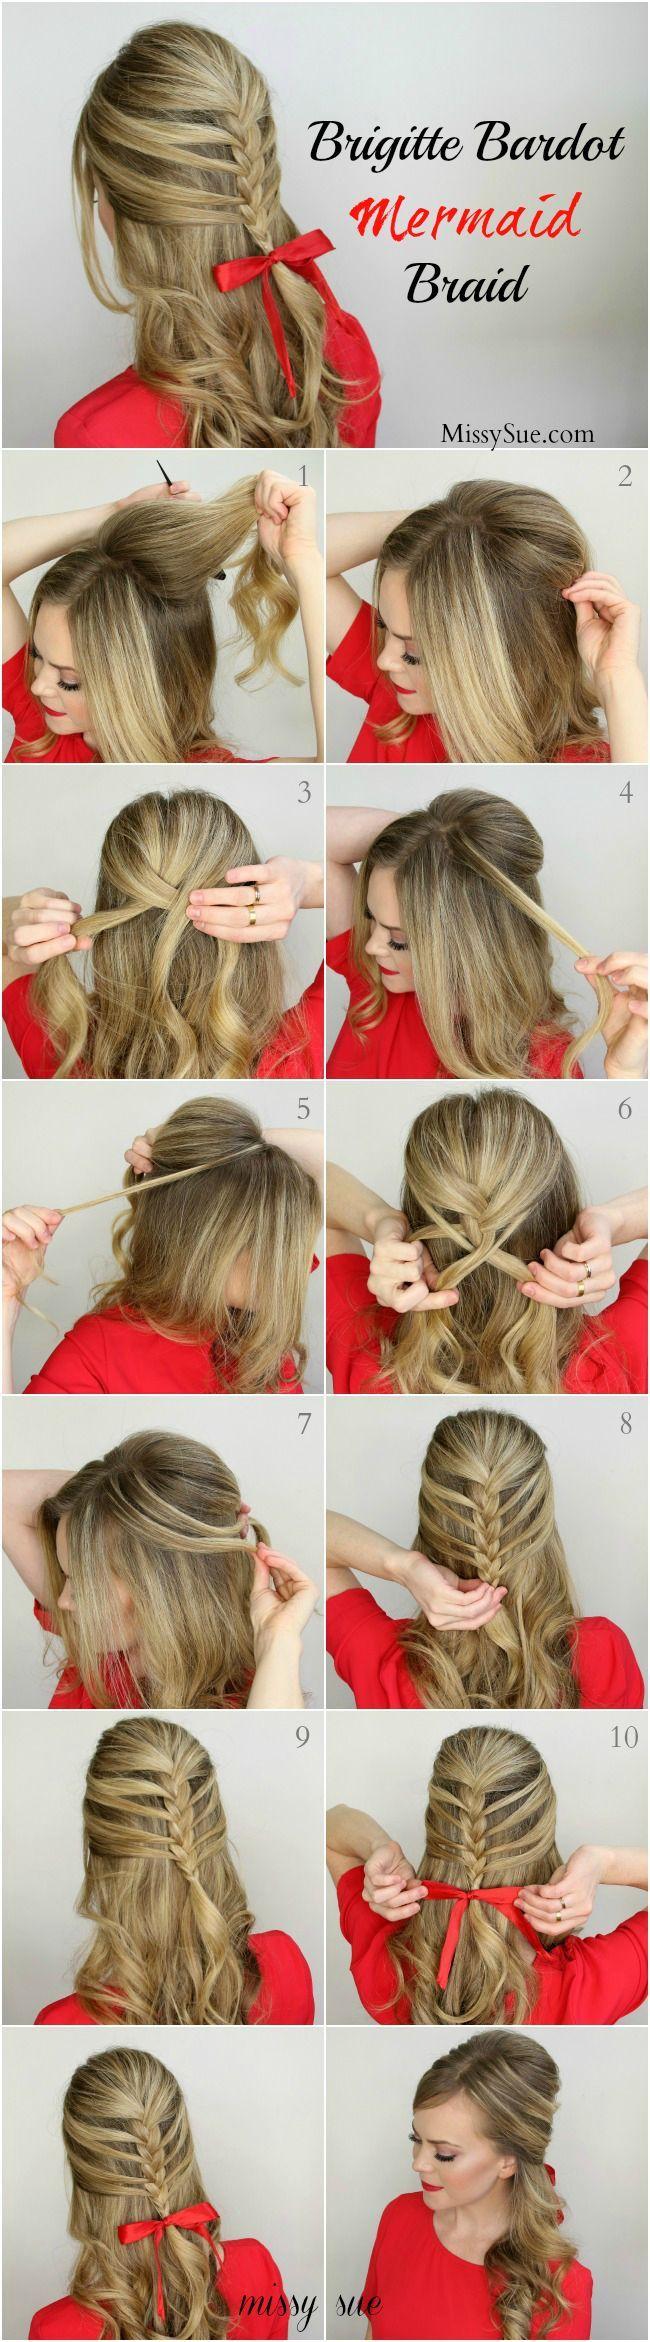 BRIGITTE BARDOT MERMAID BRAID   12 Braided Hairstyles You Should Try To Do   http://www.jexshop.com/